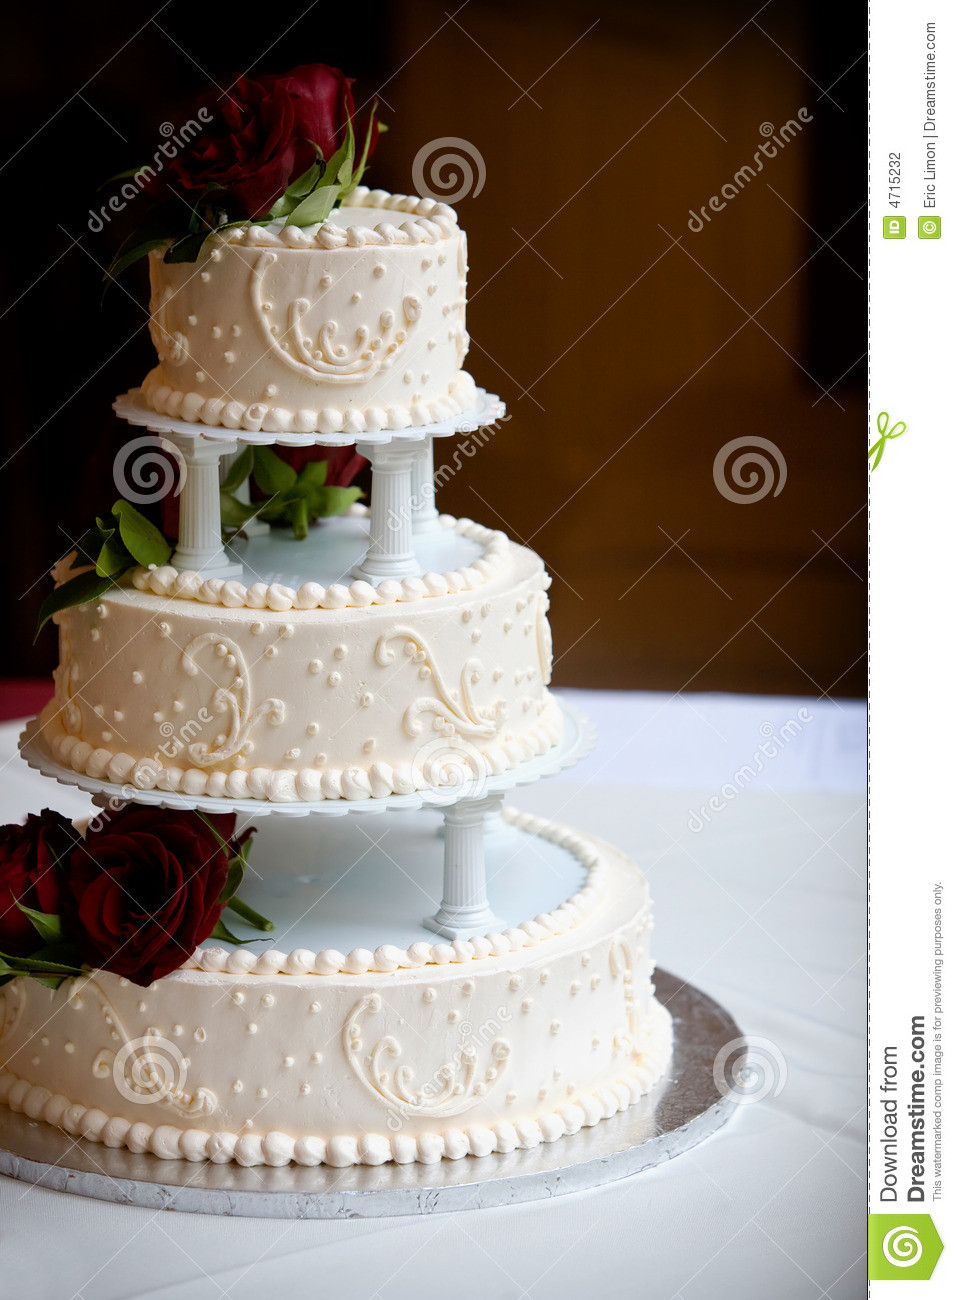 Wedding Tiered Cakes  Wedding Cake With Three Tiers Stock Image of